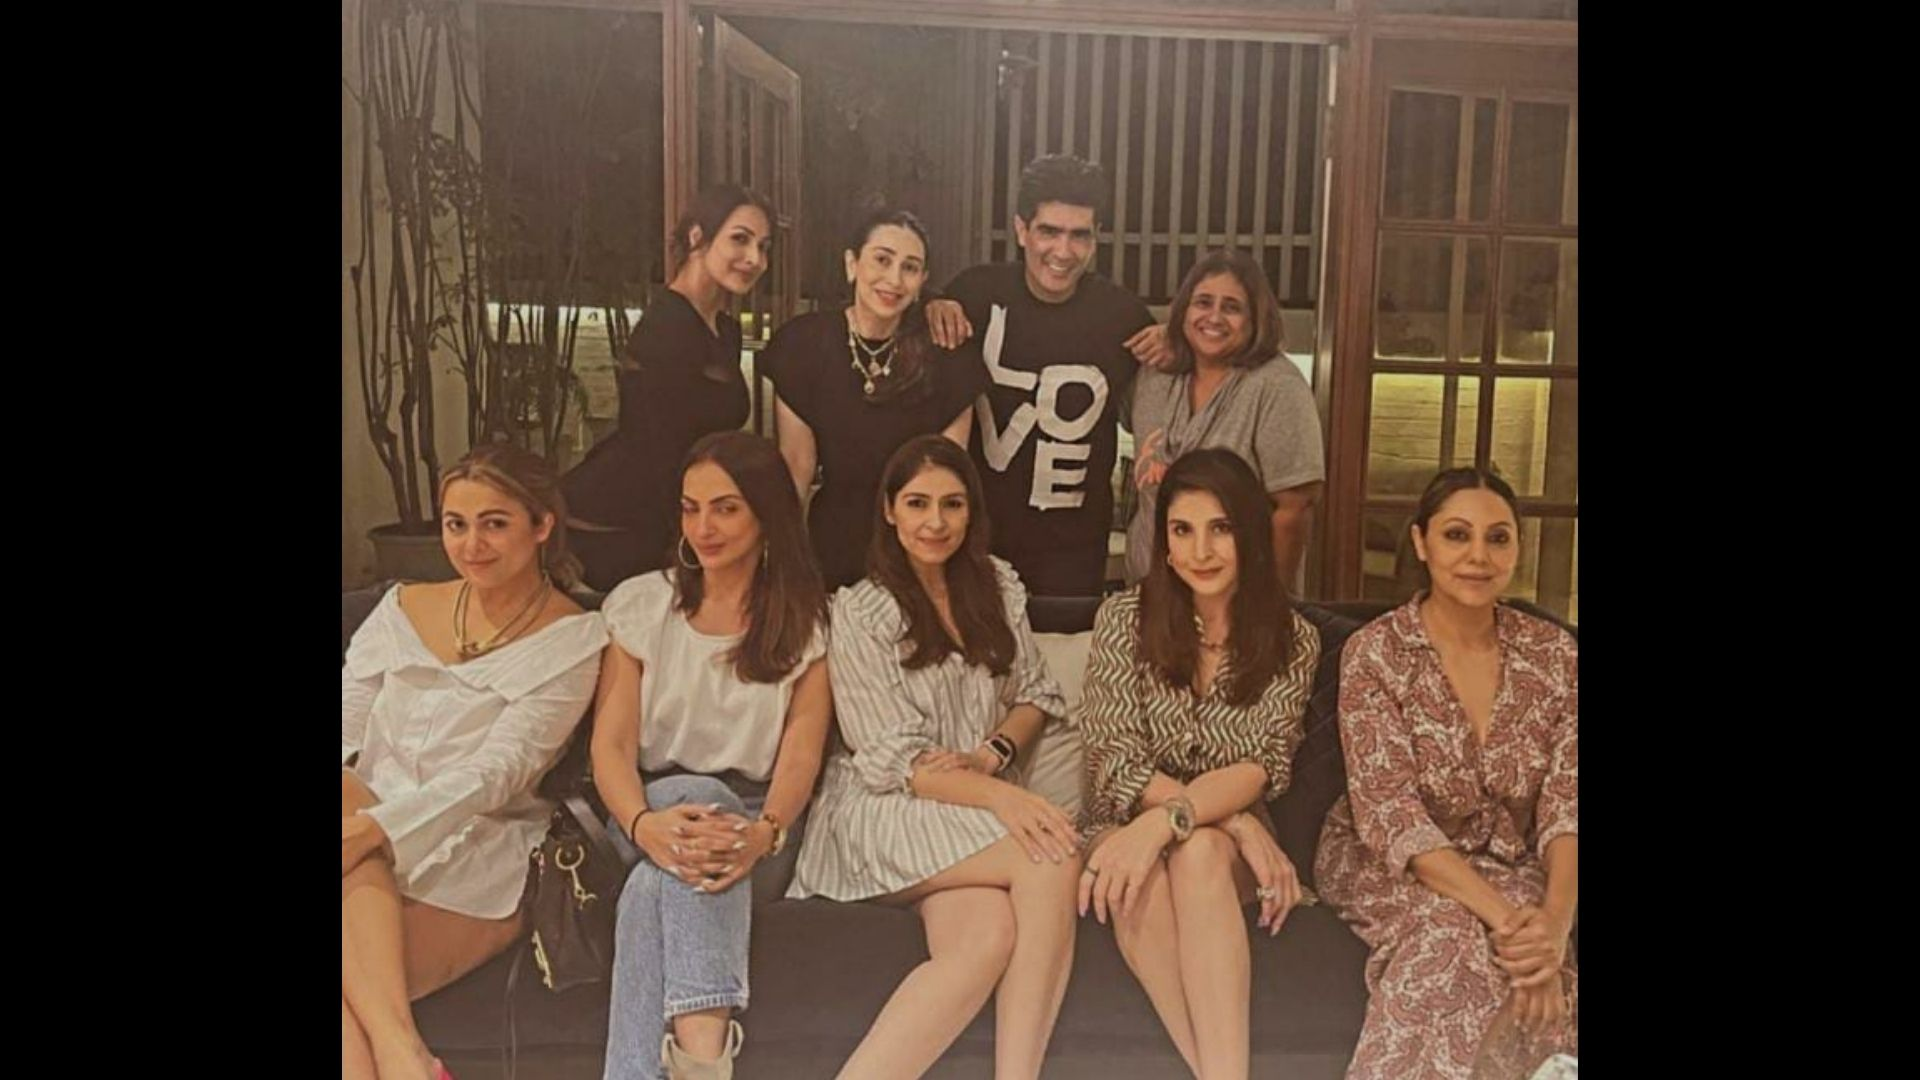 INSIDE PICS: From Ananya Panday, Gauri Khan To Malaika Arora See Who Attended Manish Malhotra's House Party; Bandra Girls Give Major Fashion Goals